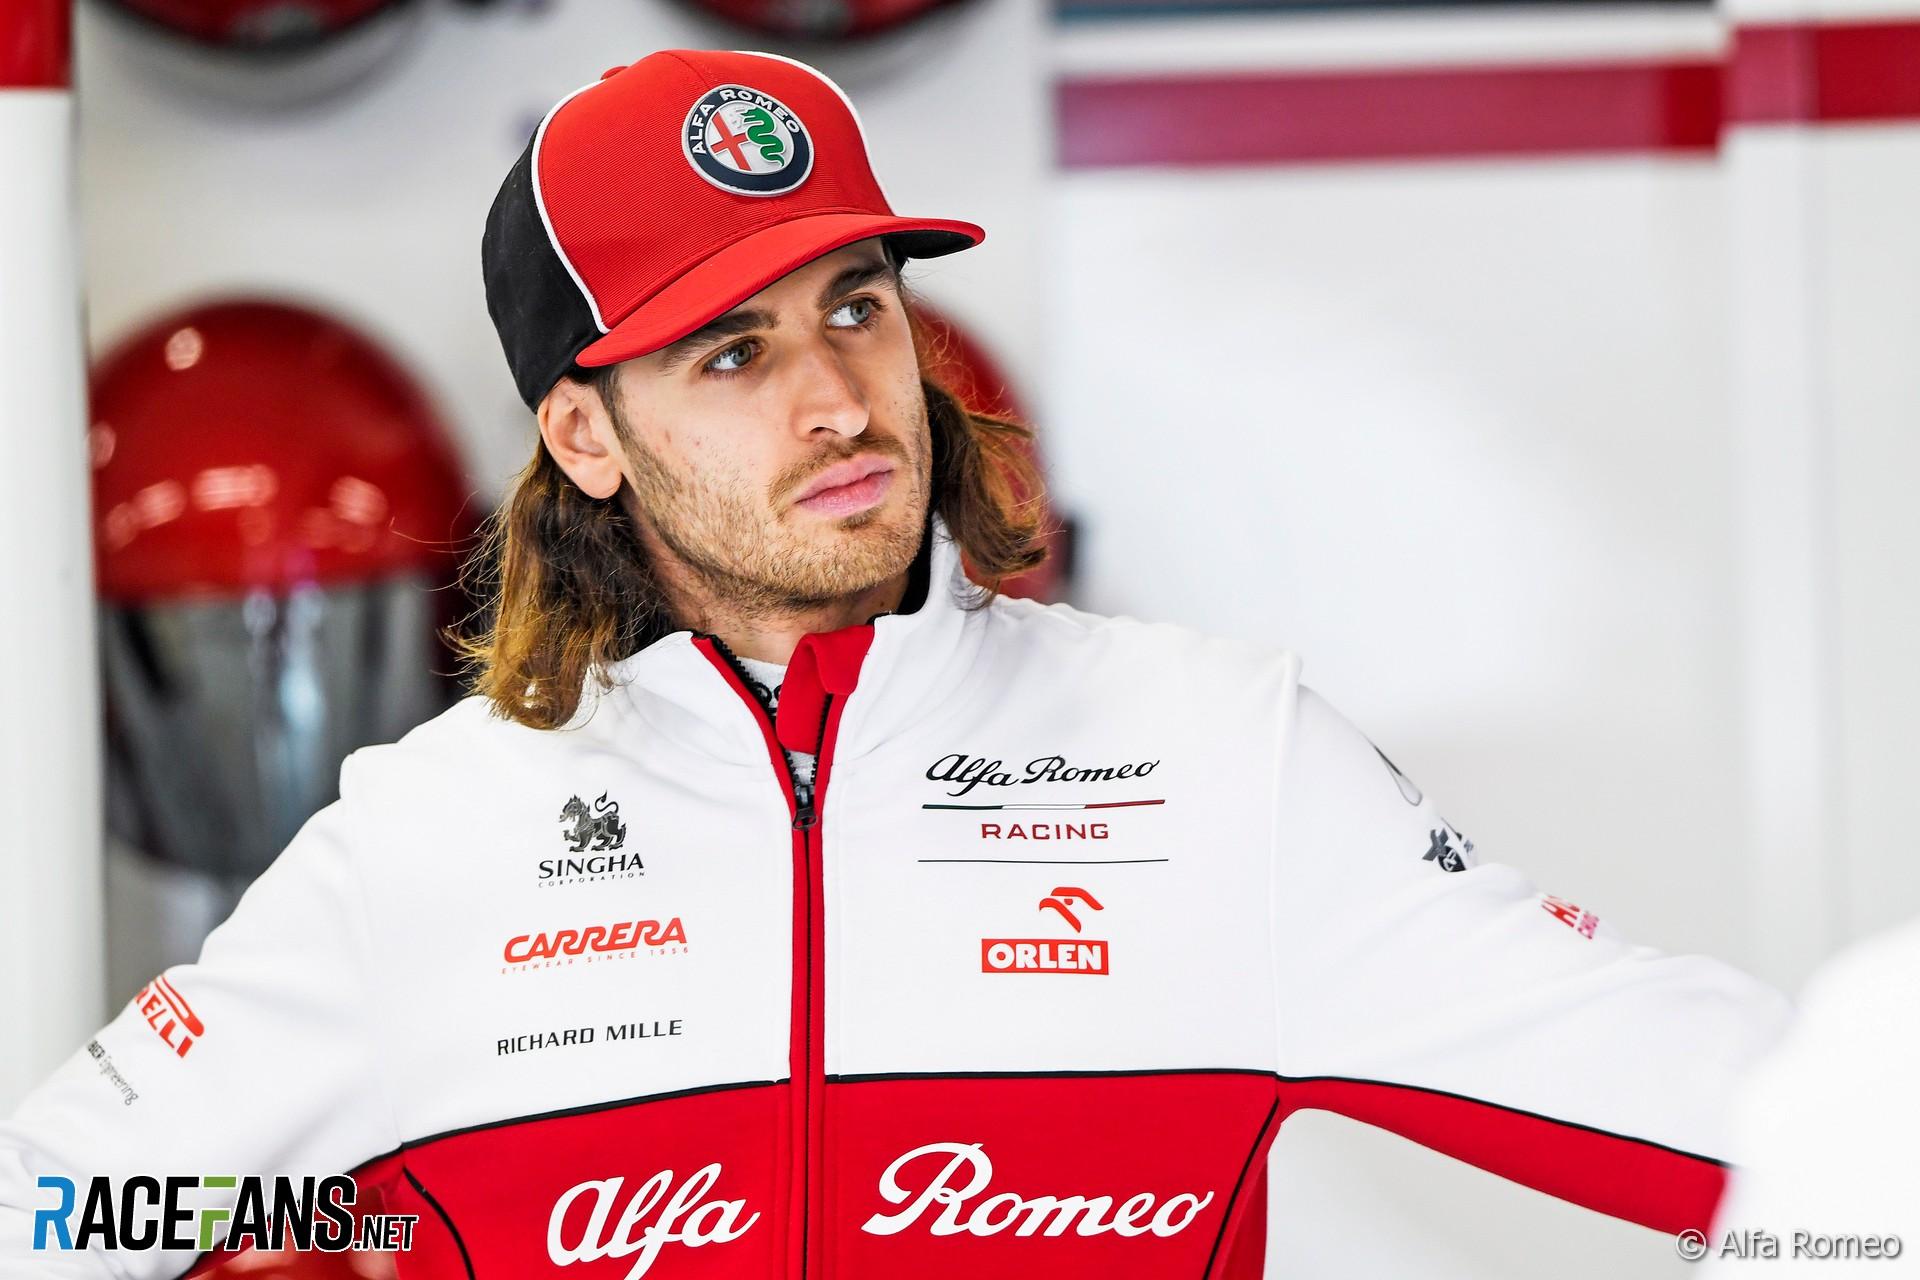 Antonio Giovinazzi, Alfa Romeo, Circuit de Catalunya, 2020